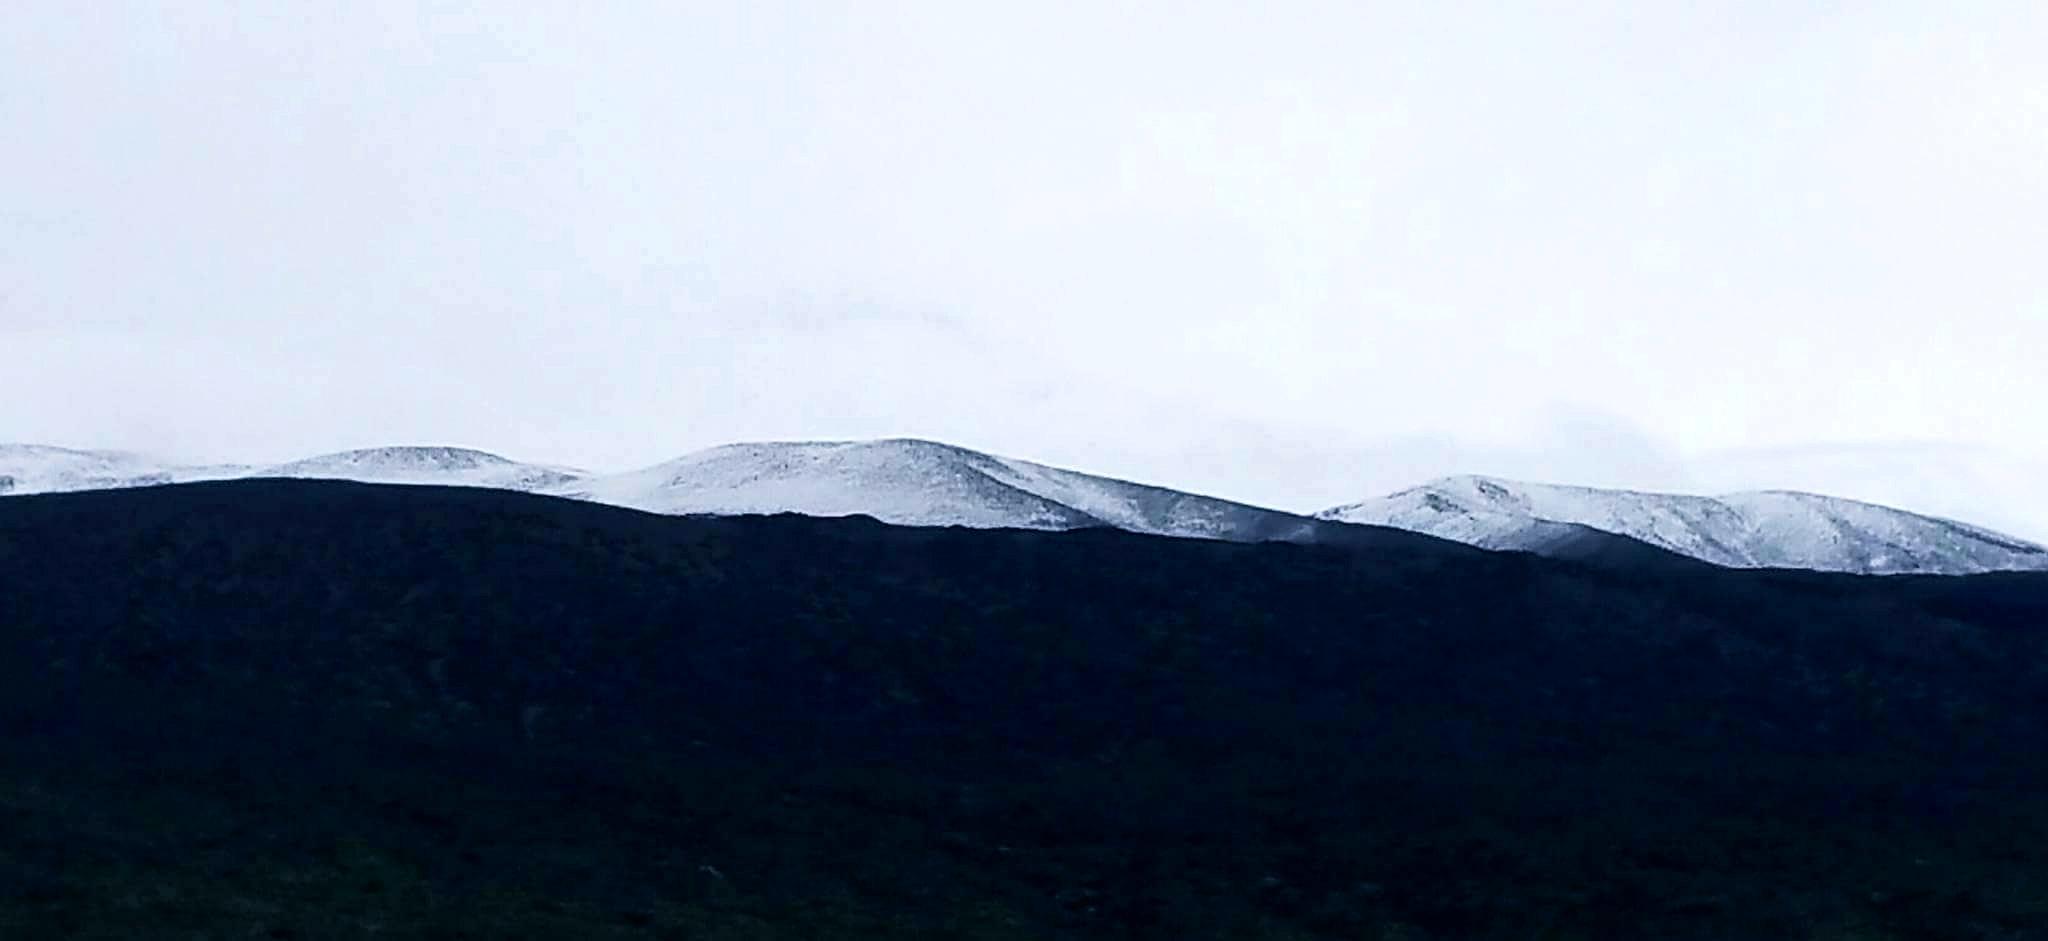 Snow blanketing Mauna Kea at Pōhakuloa Training Area, Thursday Dec. 1, 2016. Photo: Lei Smith.